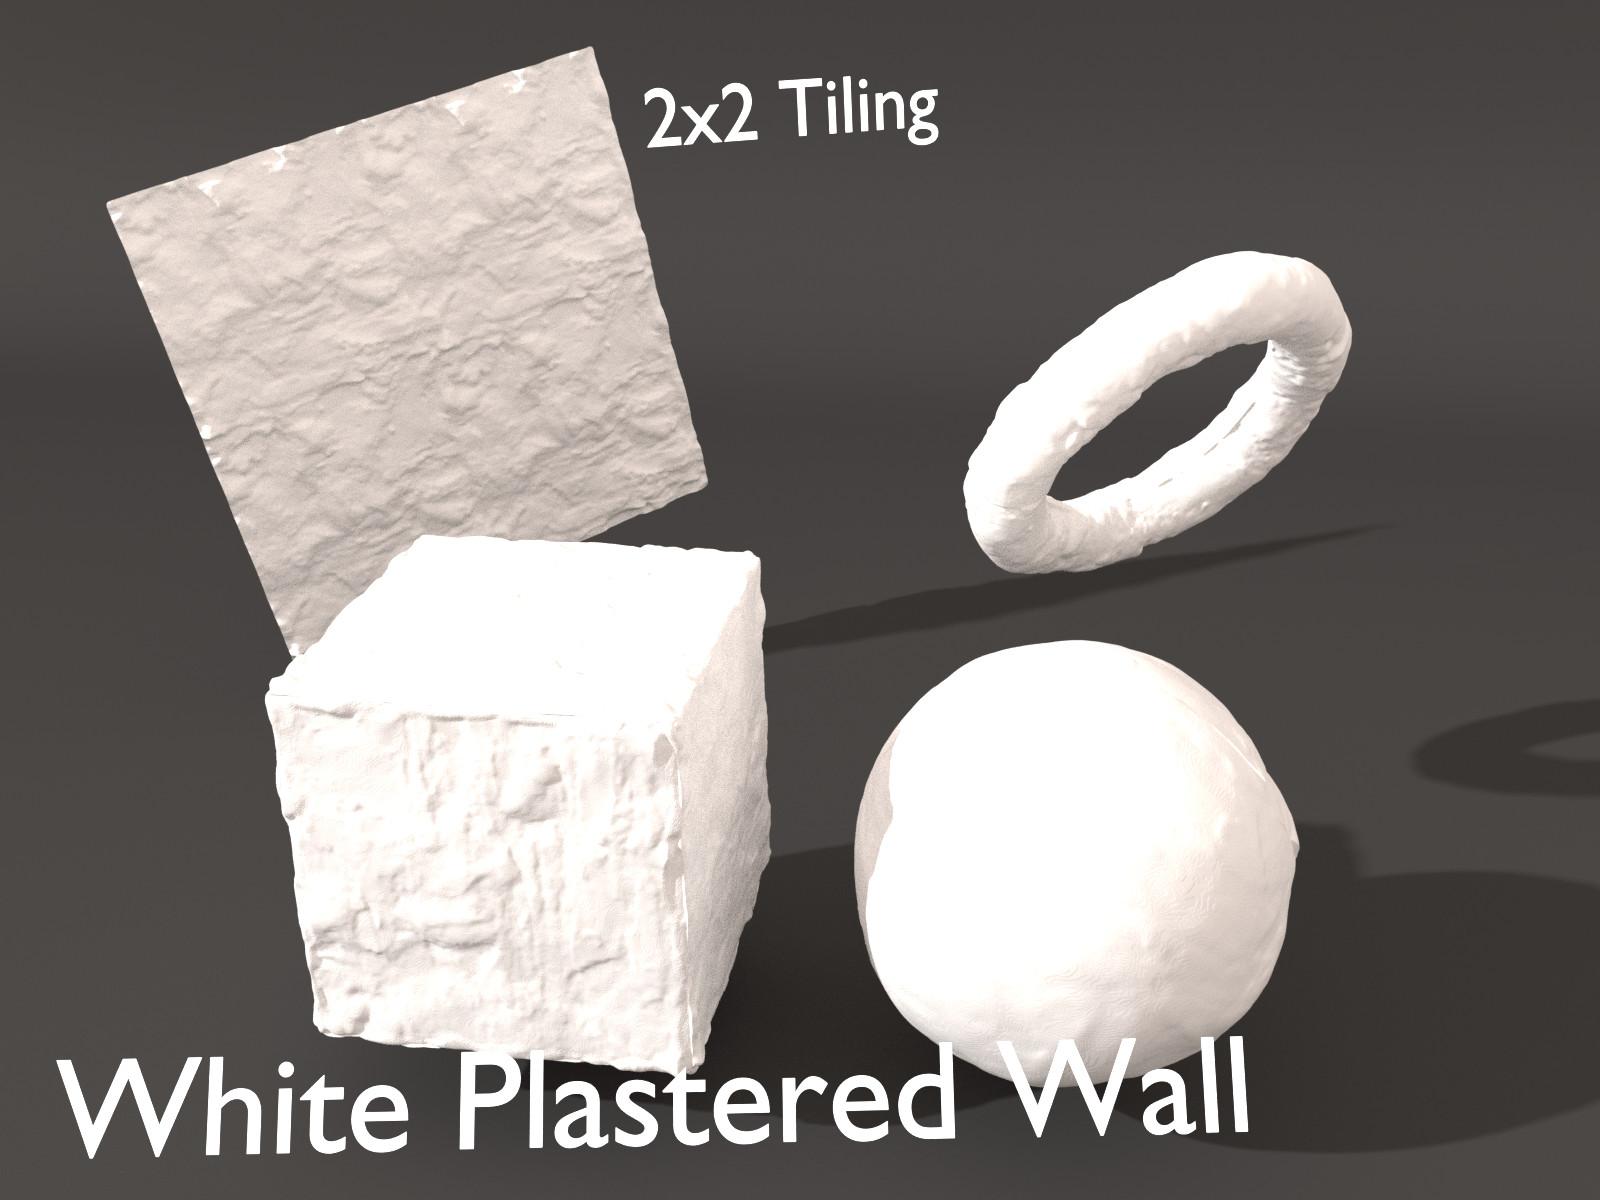 Sieben corgie whiteplasteredwall l